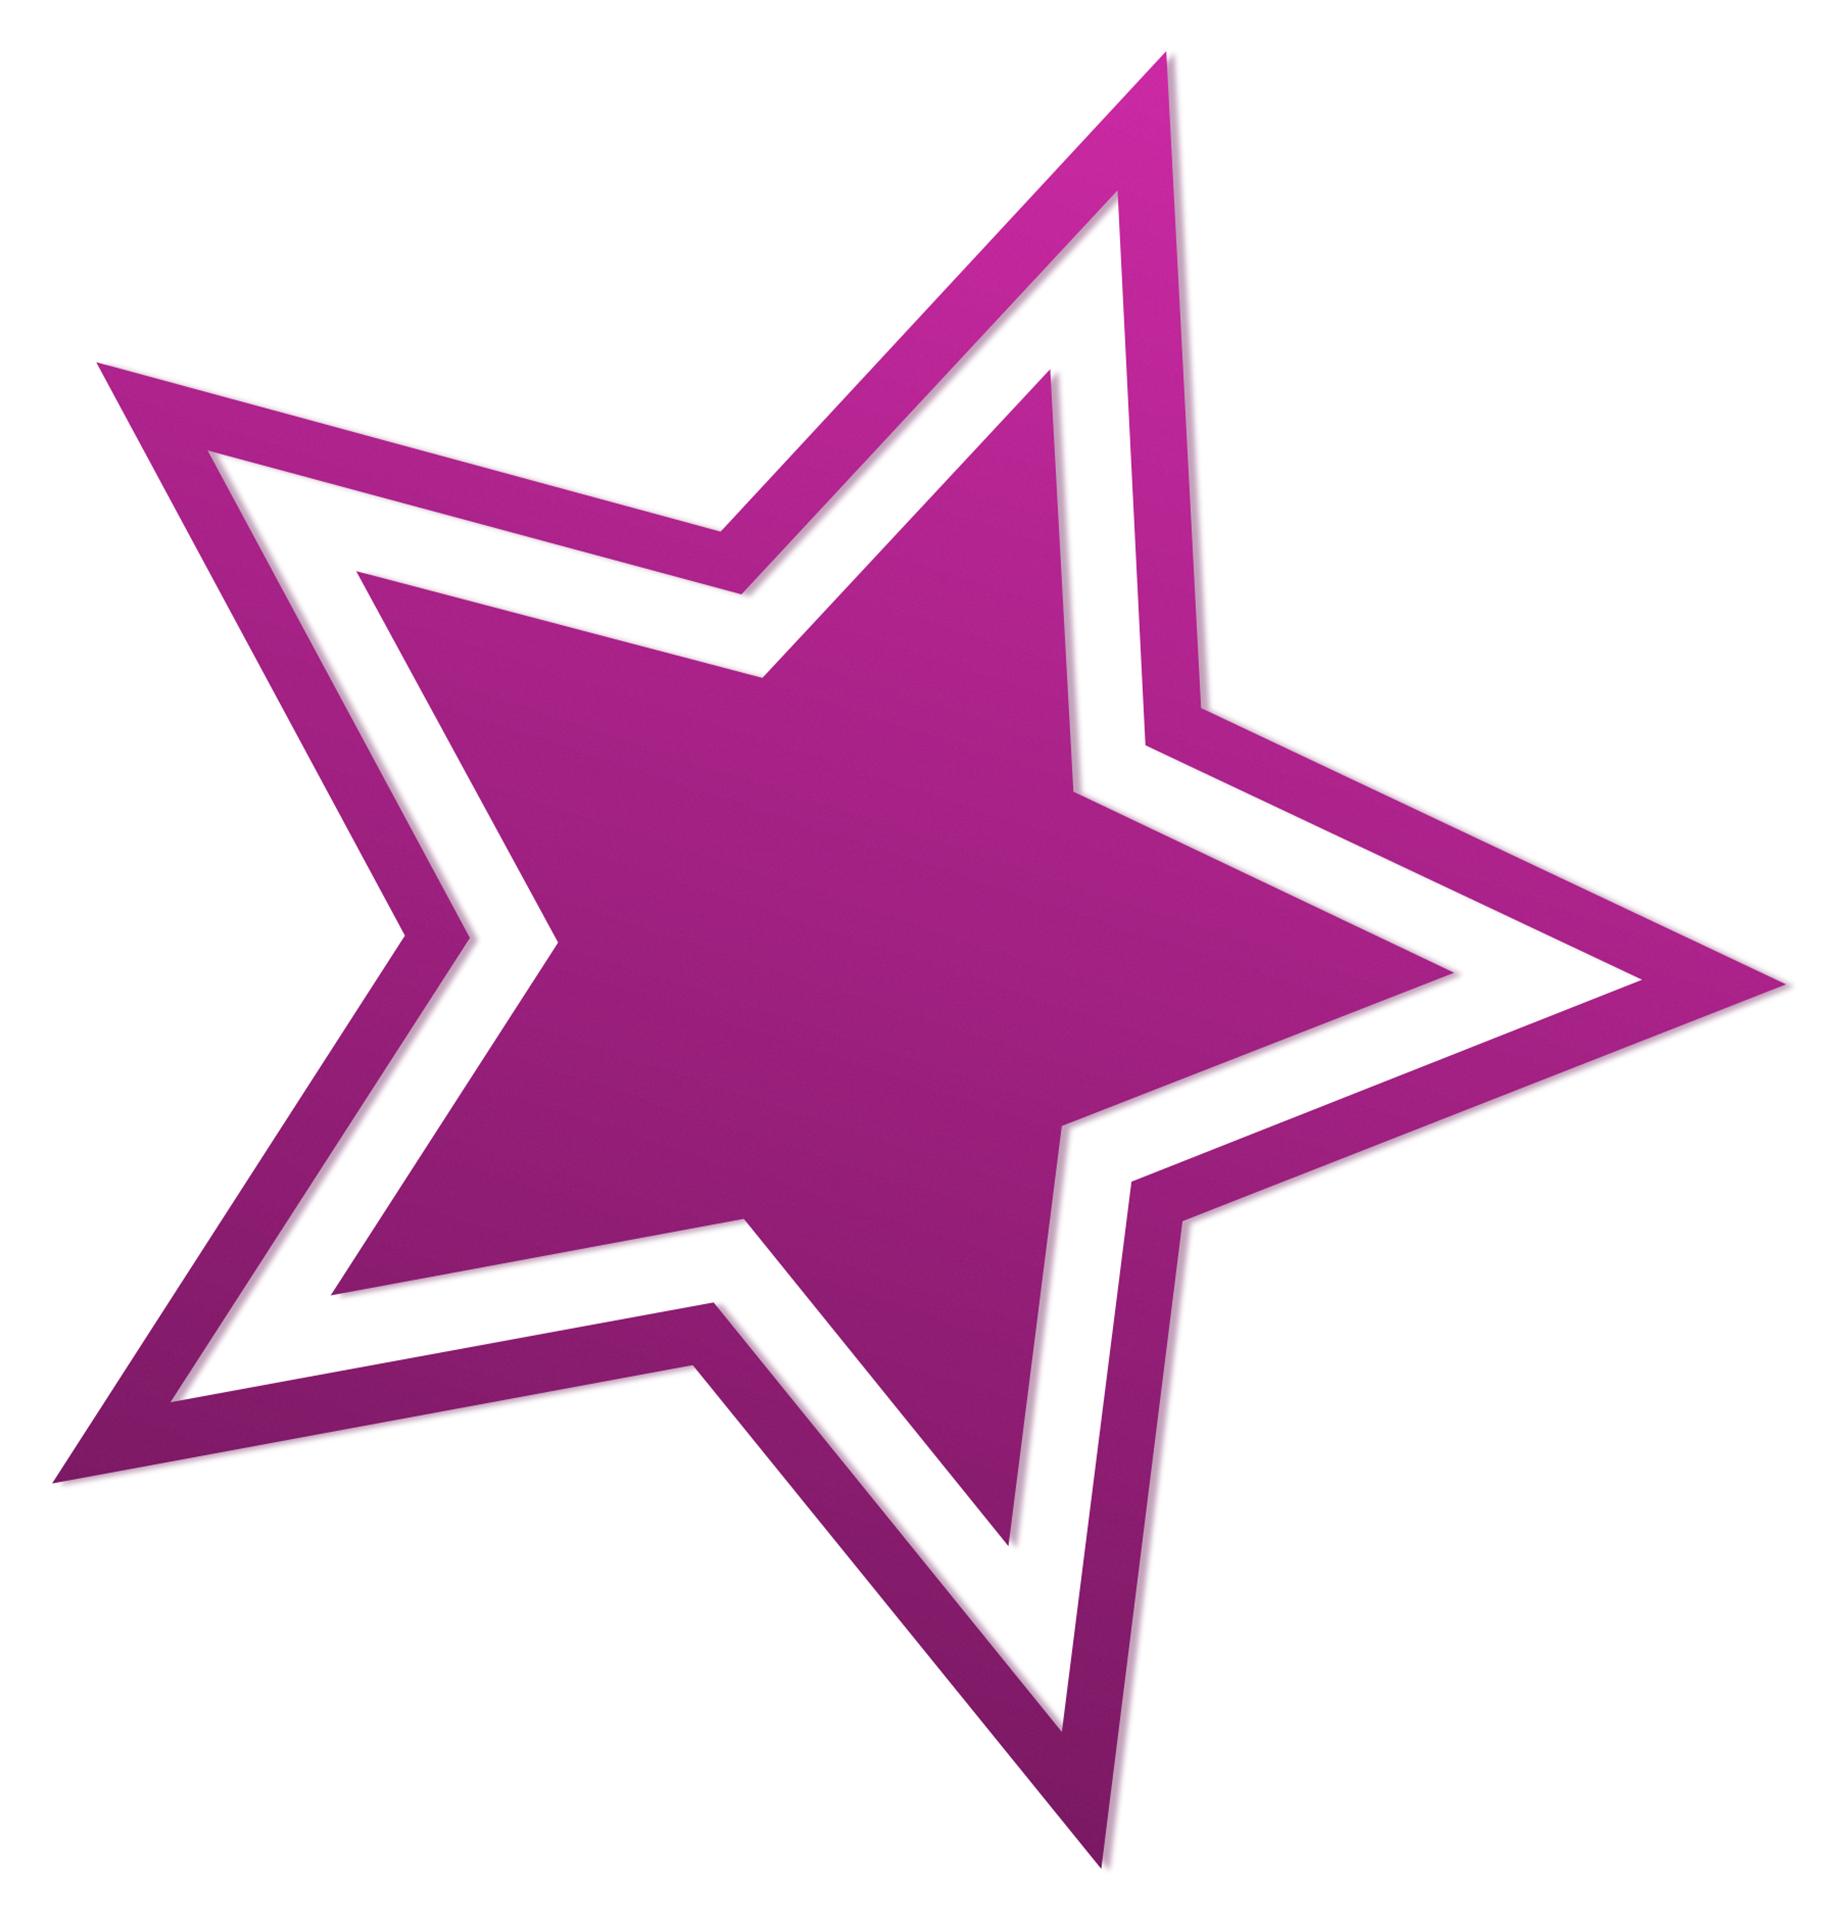 Forum on this topic: User: PinkStar, user-pinkstar/